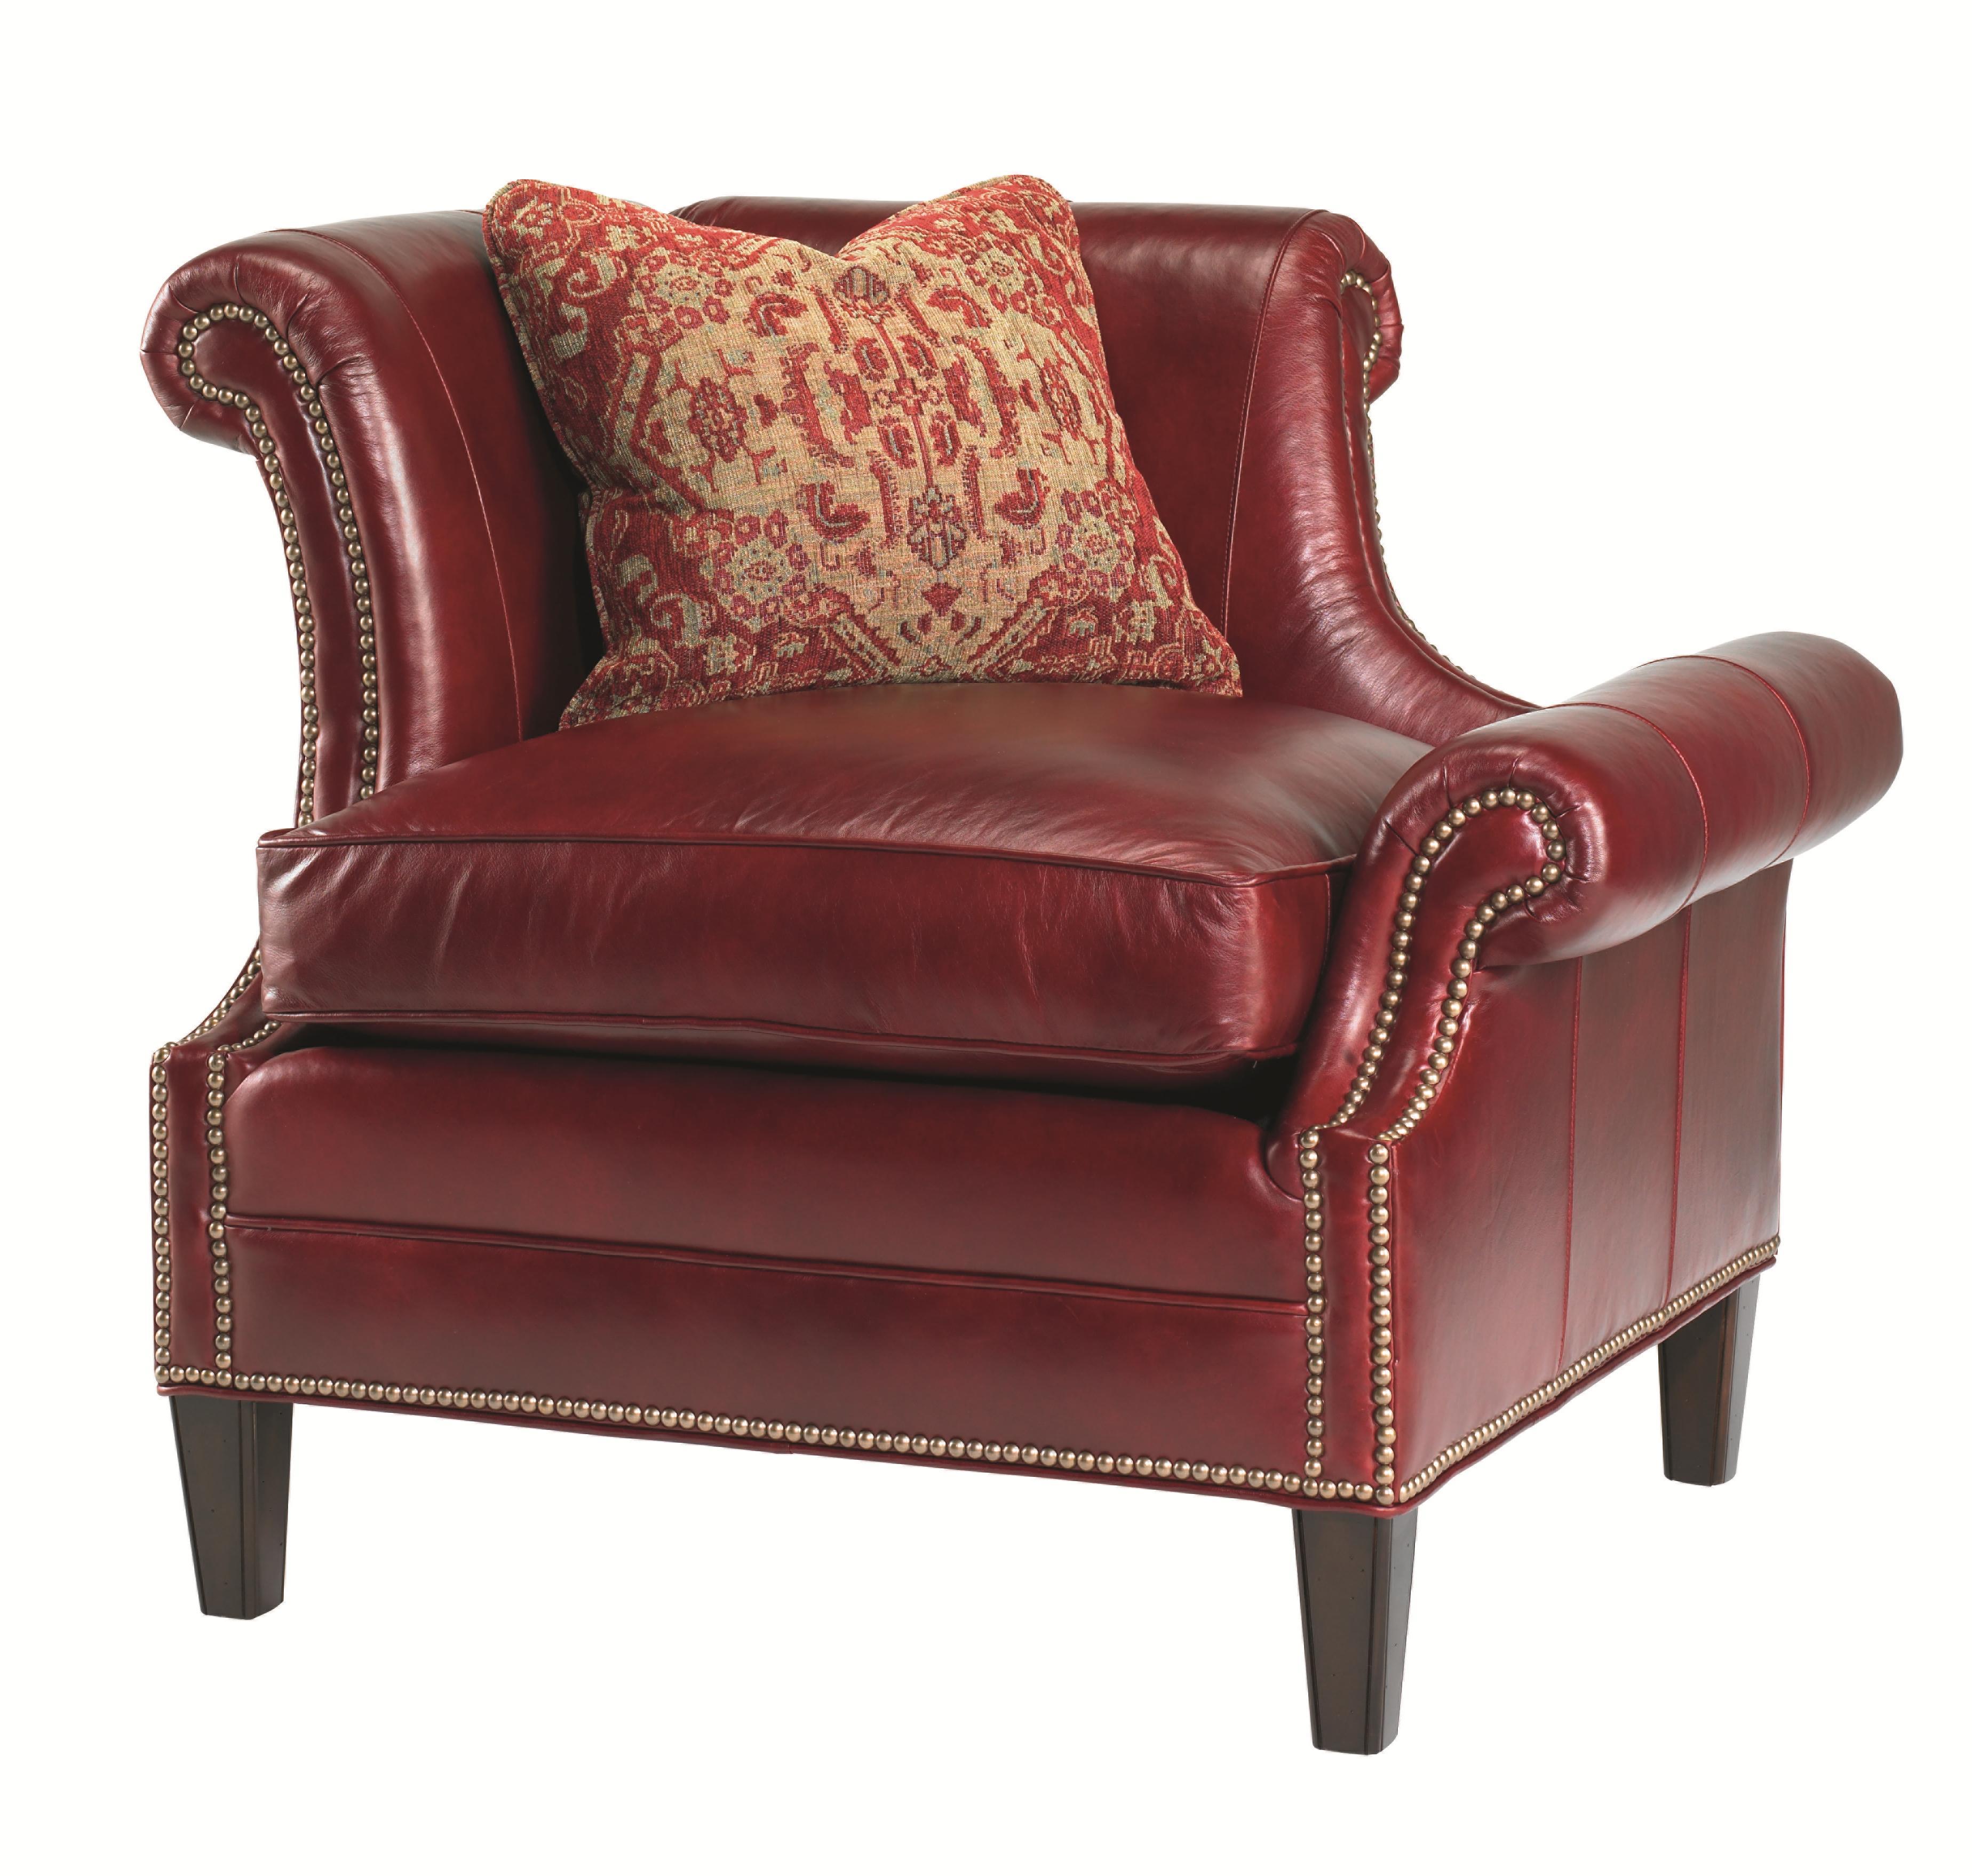 Braddock Laf Upholstered Chair